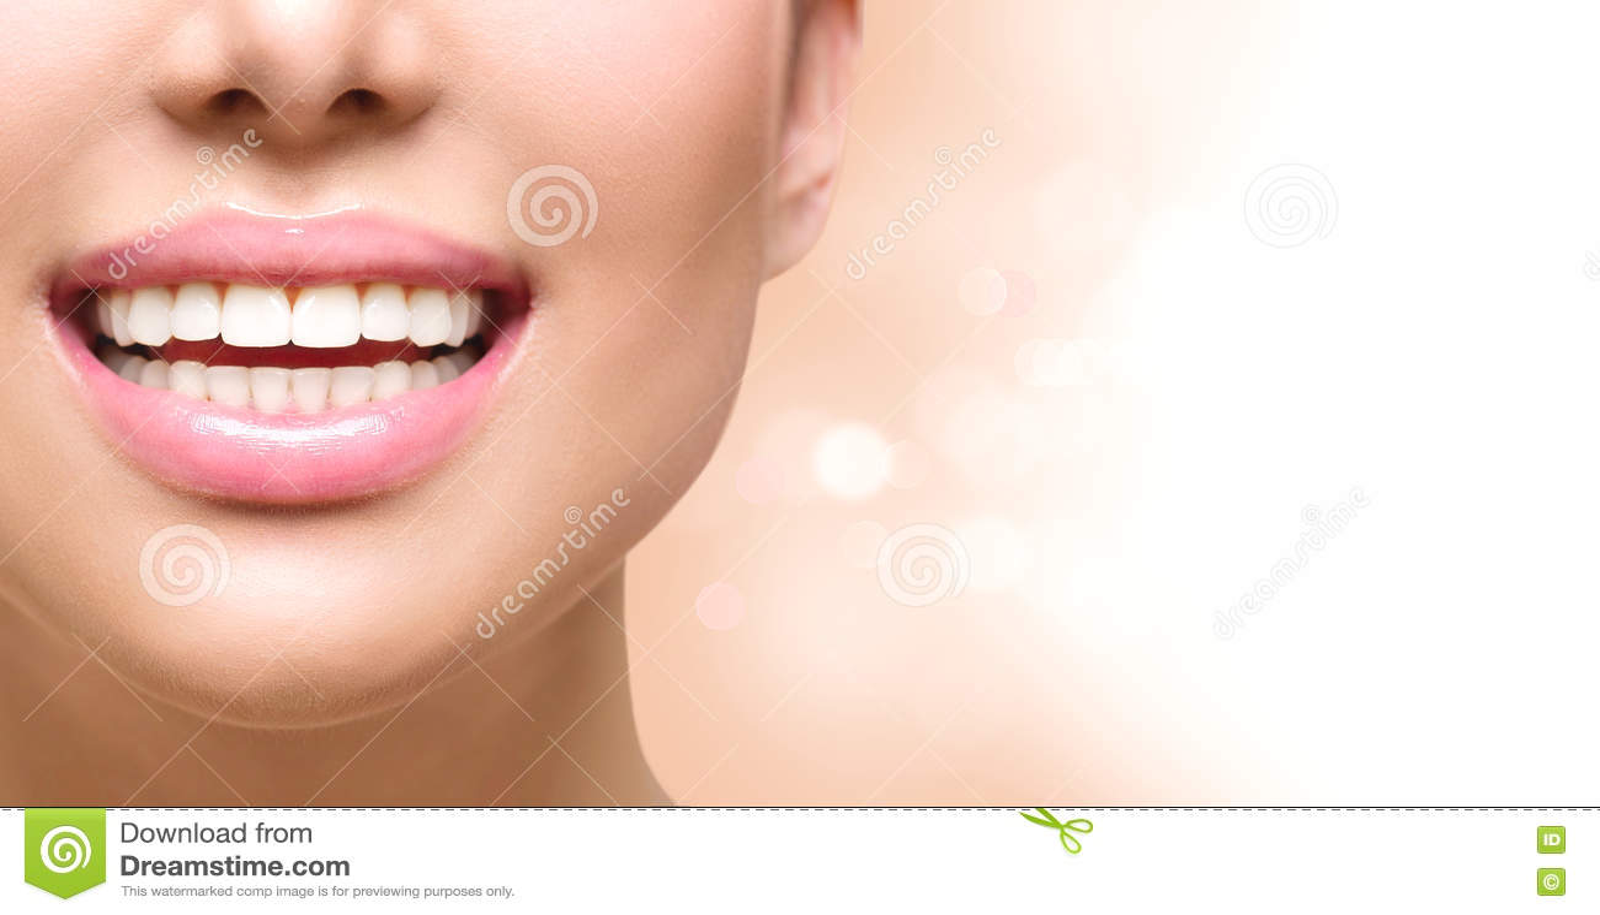 Sourire sain Dents blanchissant Soin dentaire